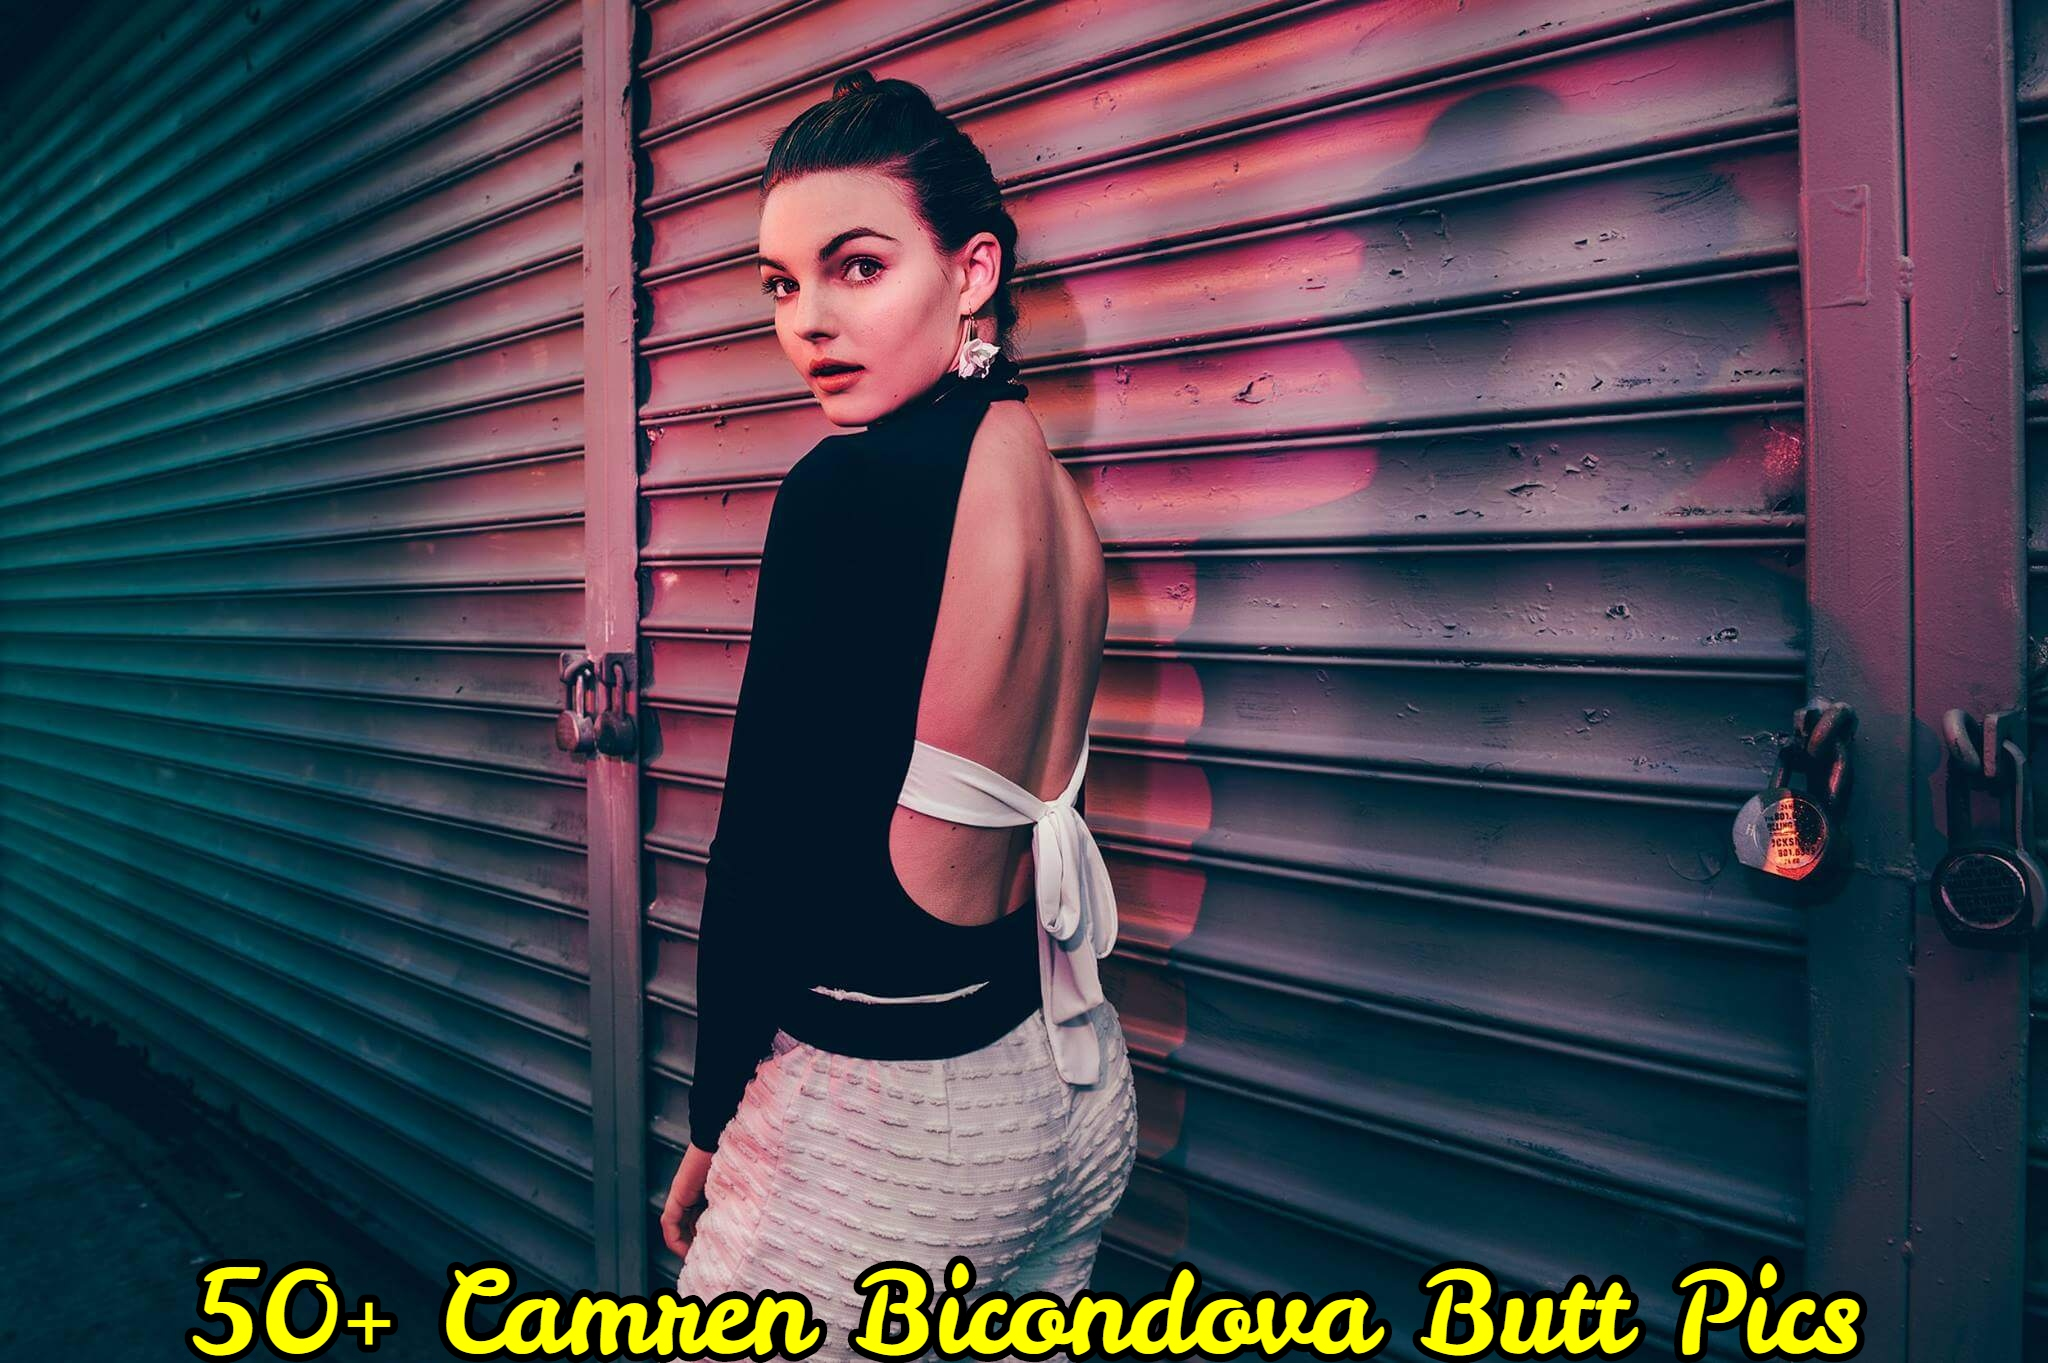 Camren Bicondova butt pics.